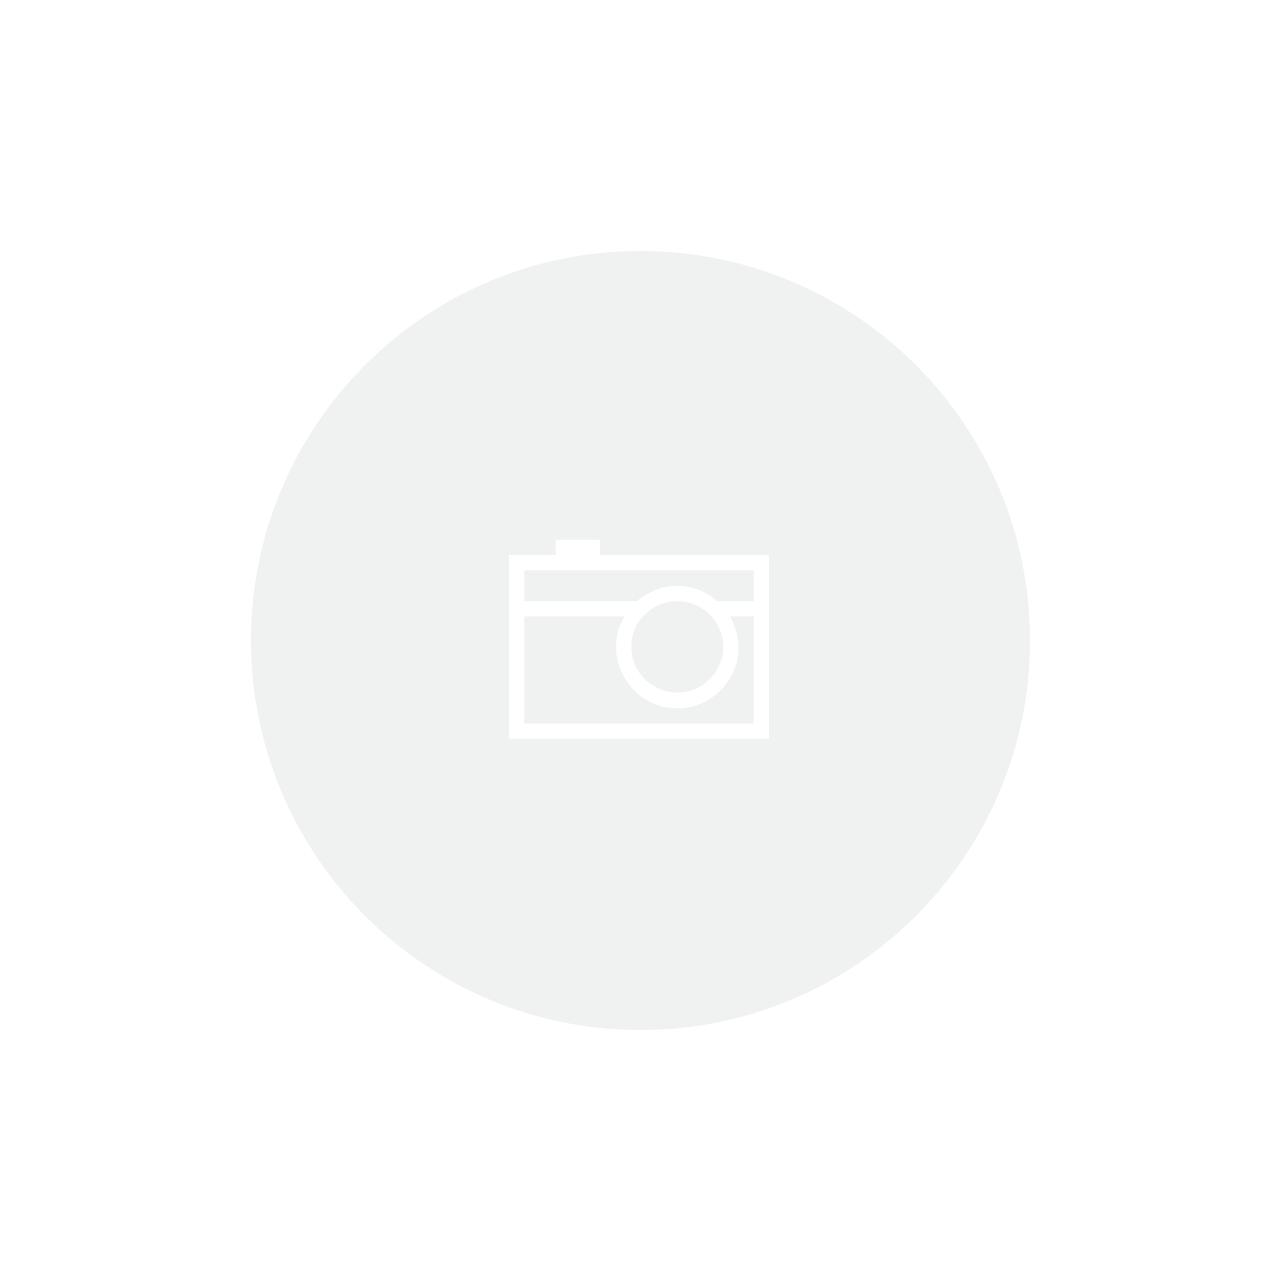 ROLO TREINAMENTO ELITE QUBO FLUID C/ELASTOGEL (1 DIA DE USO)